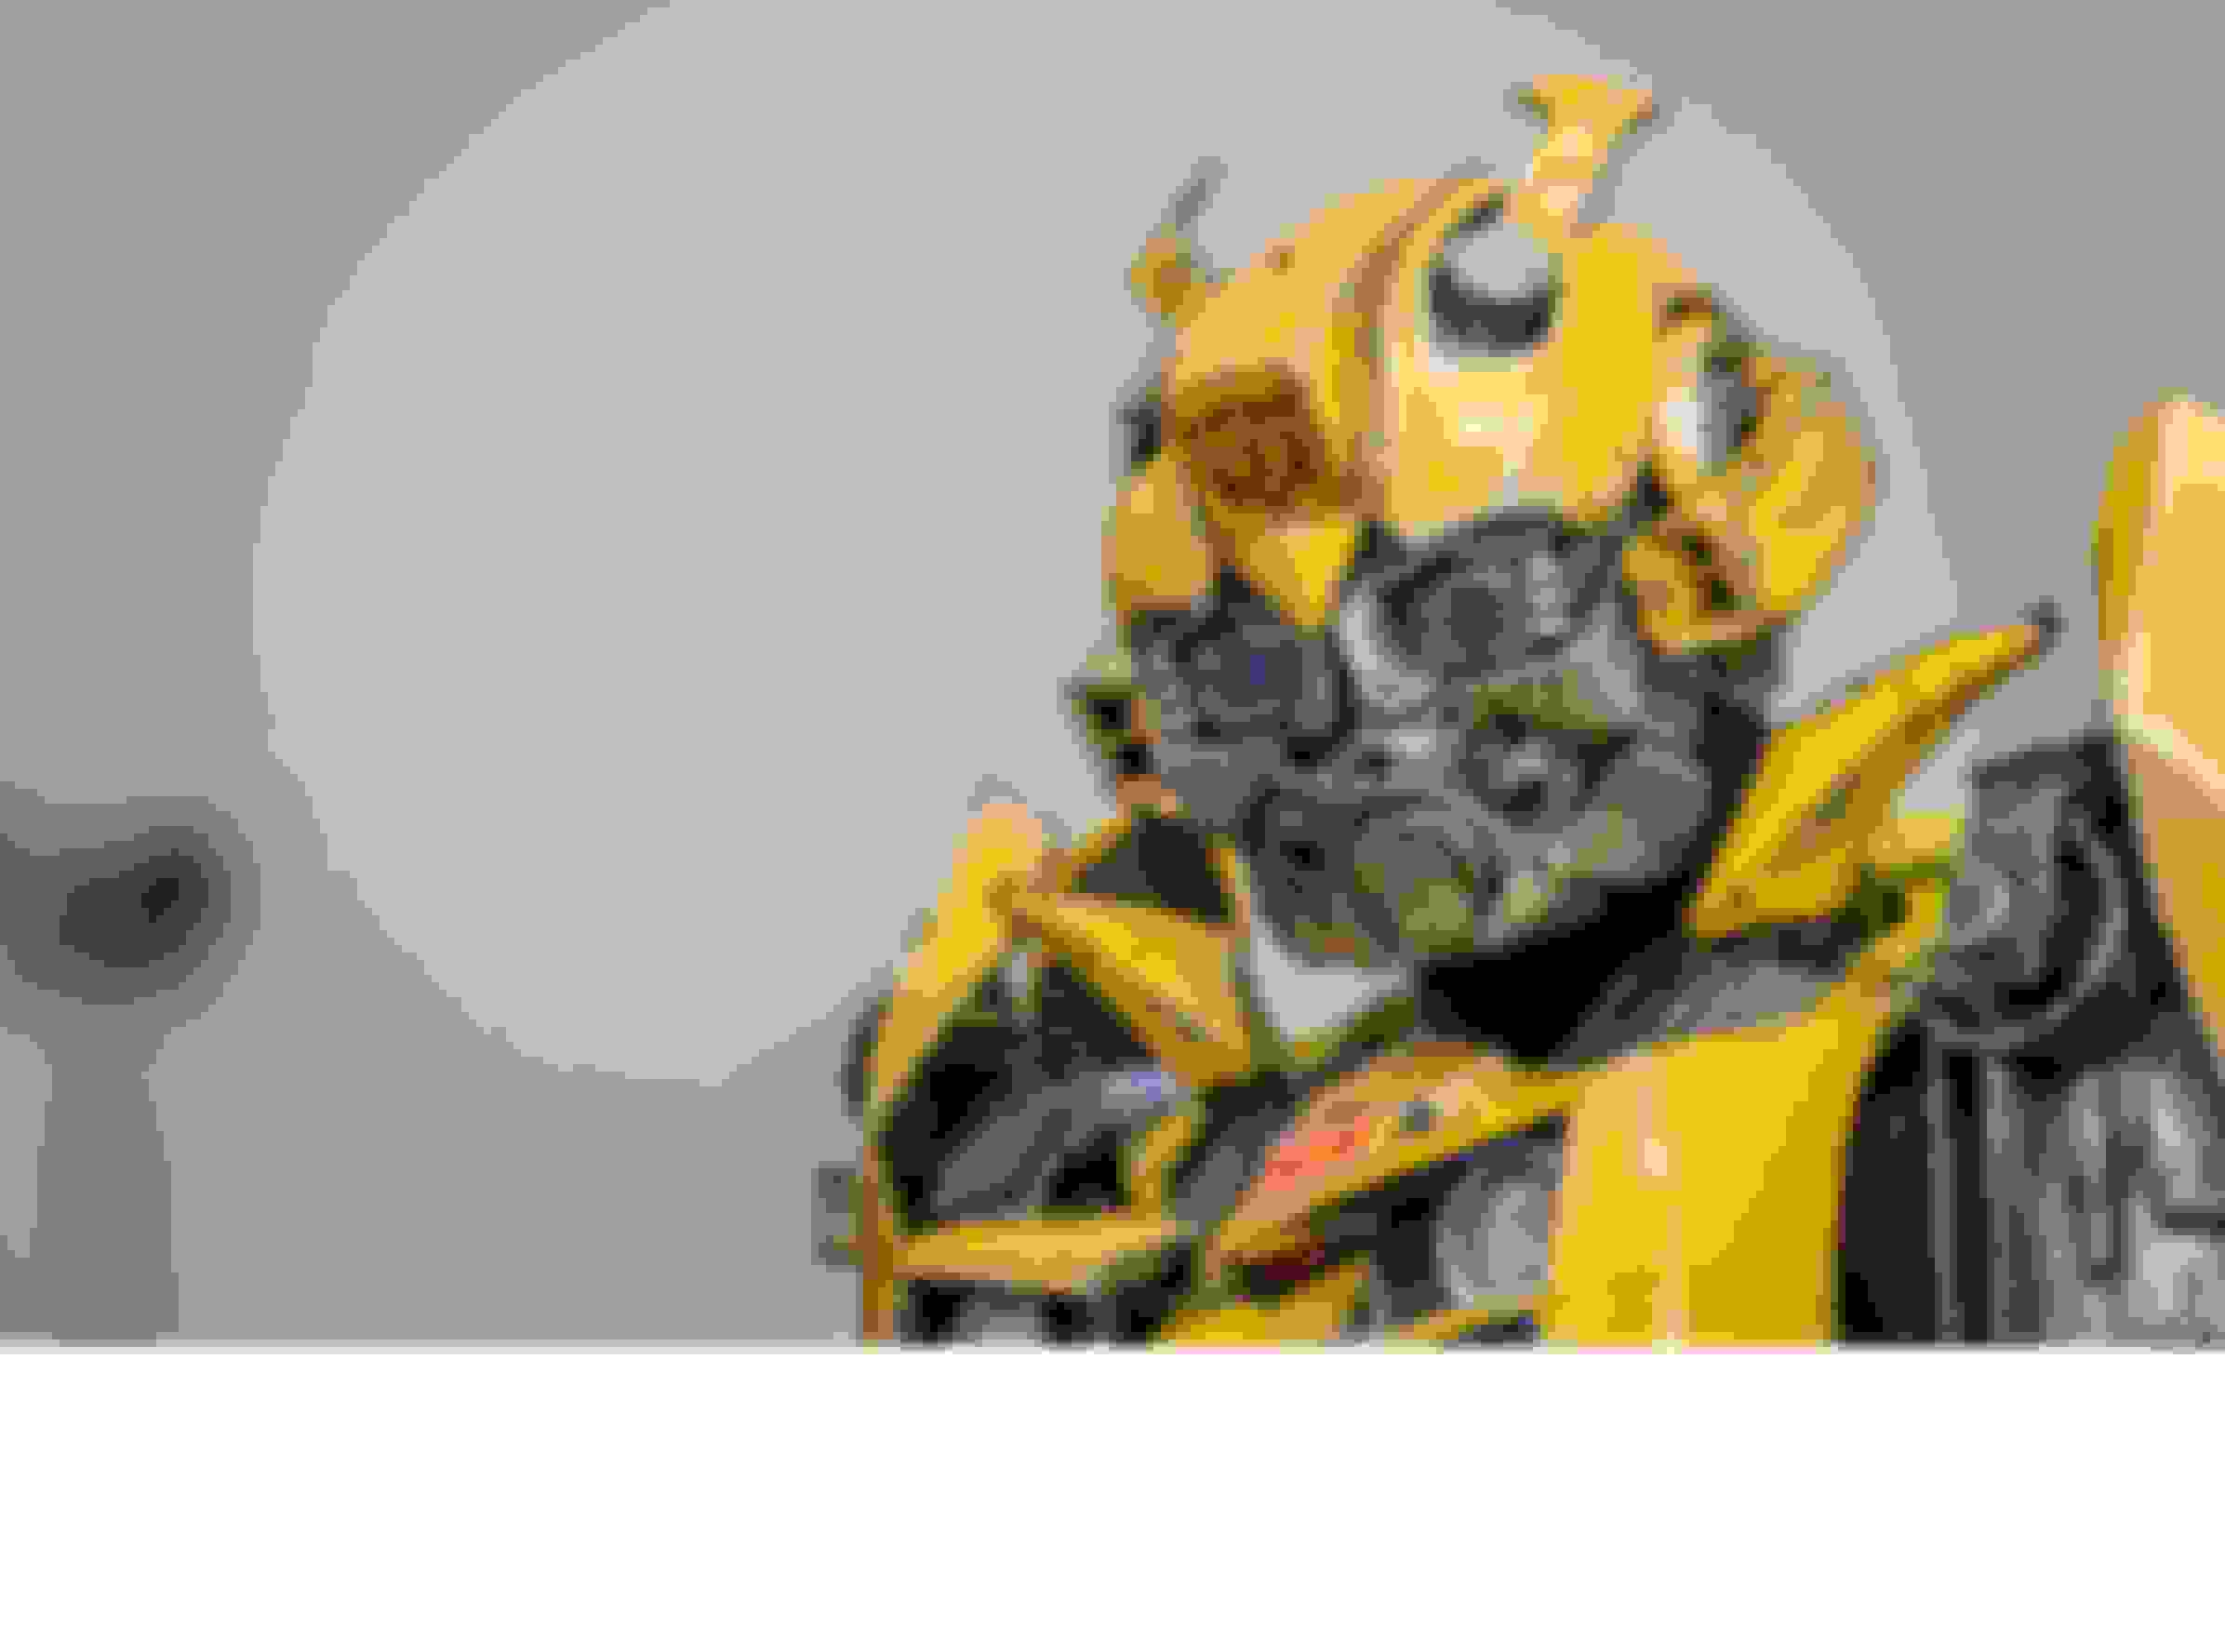 Bumblebee Transformer Robot